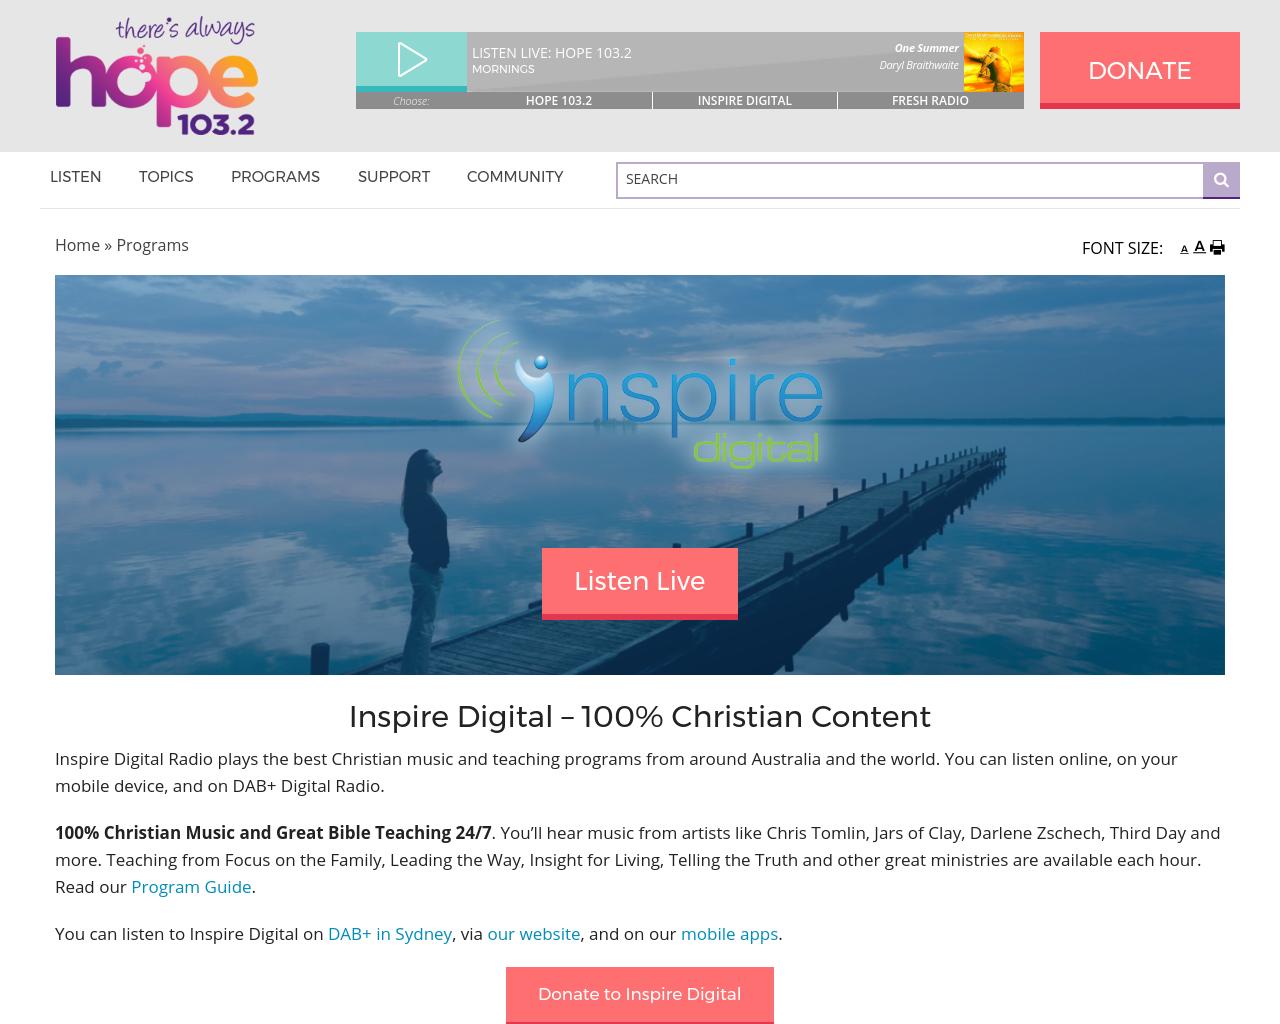 Inspire-Digital-Radio-Advertising-Reviews-Pricing